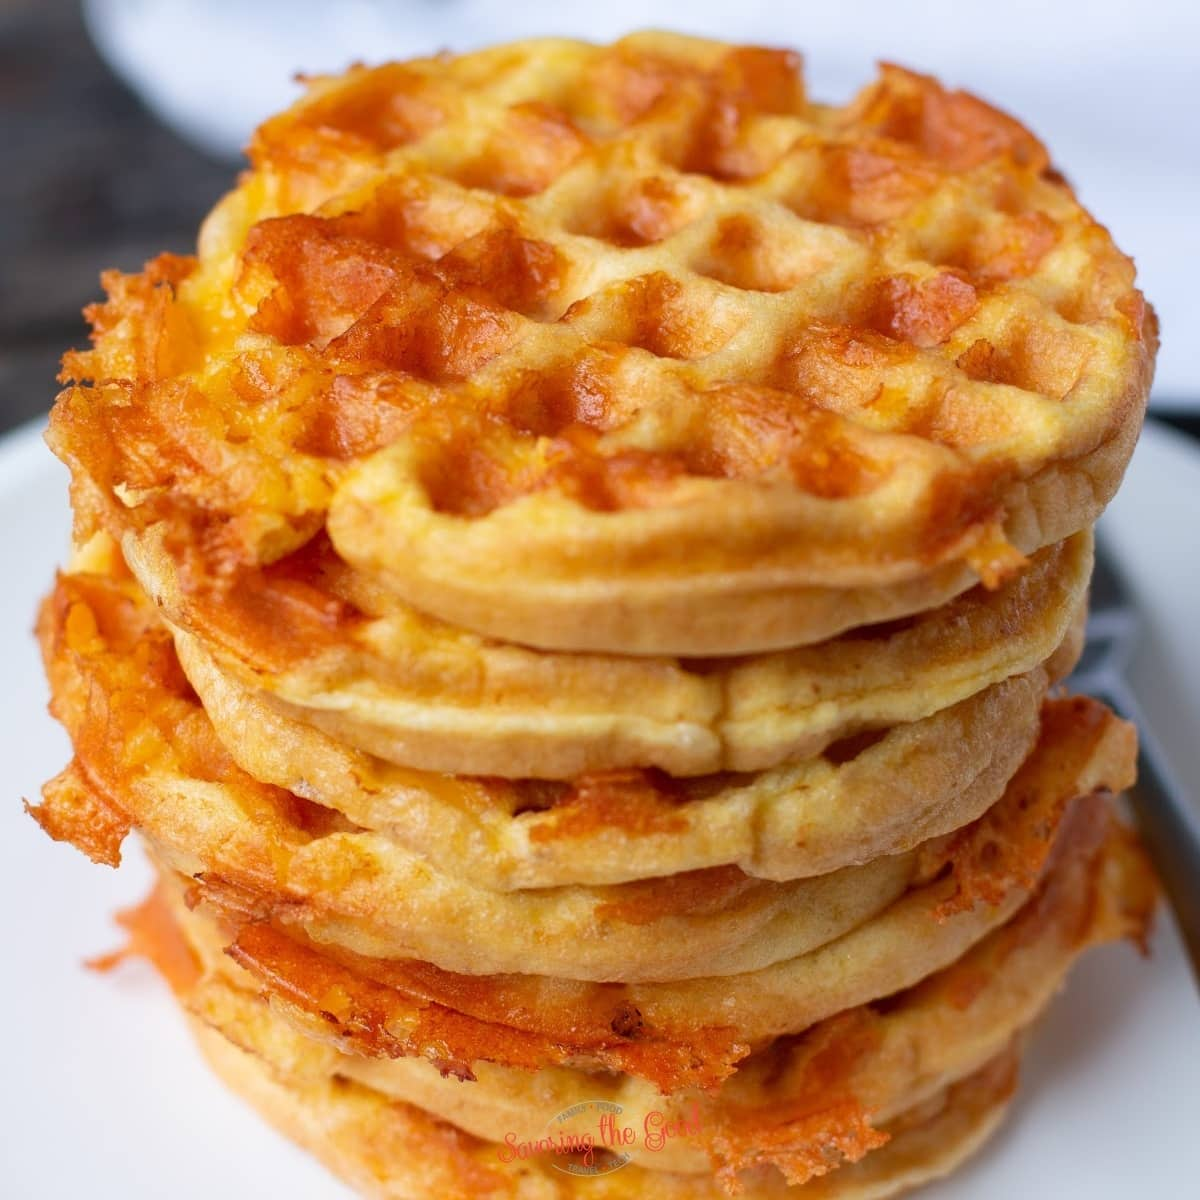 chaffle recipe showing crispy cheesy texture